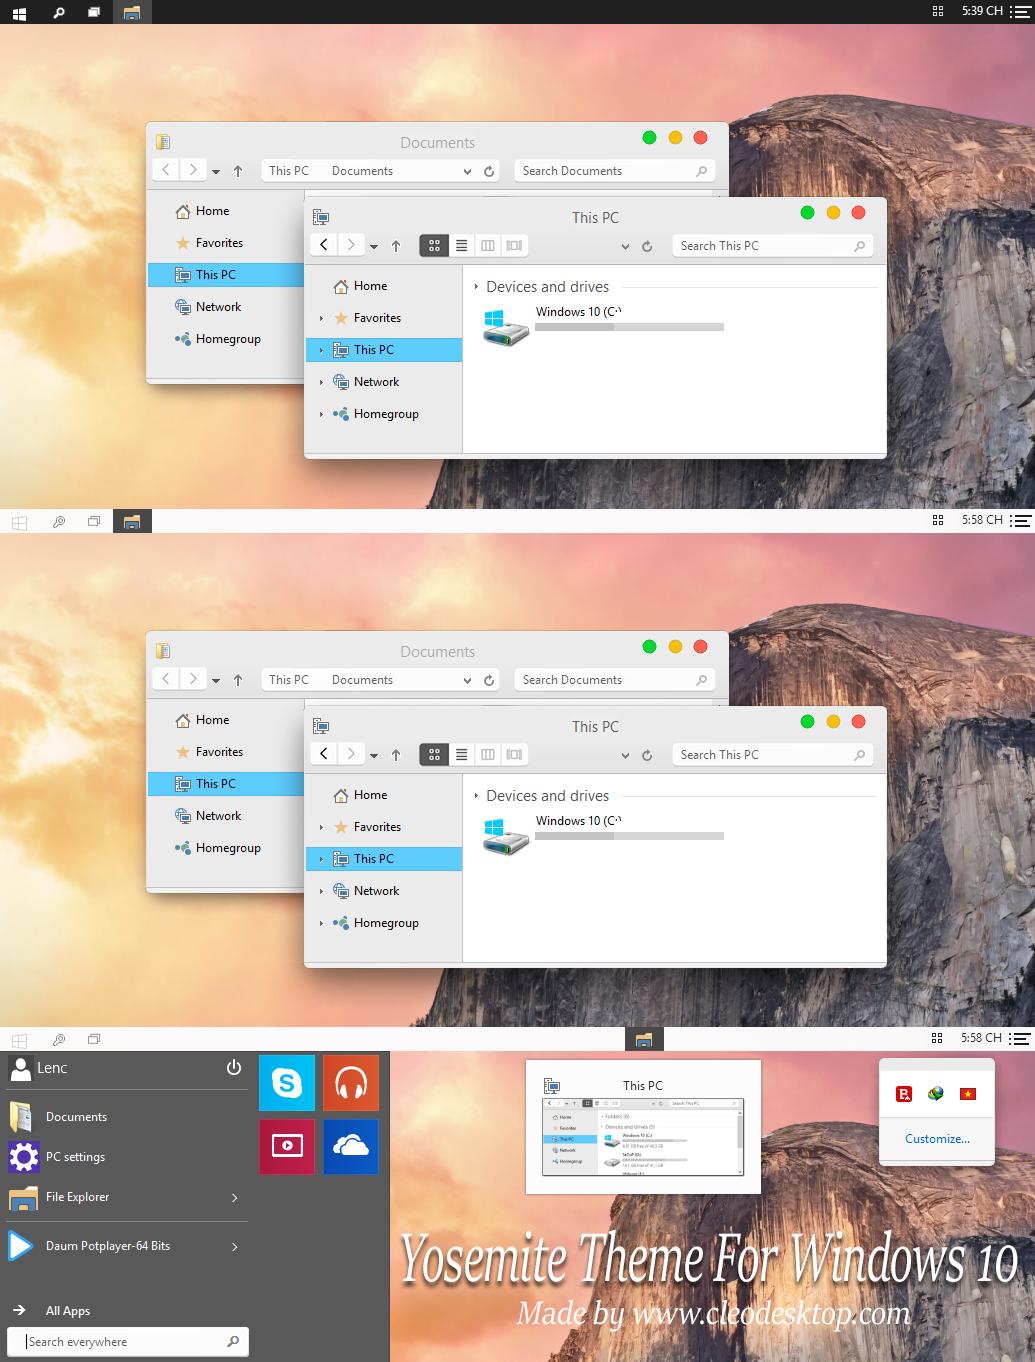 OS X Yosemite Theme For Windows 10 by Cleodesktop